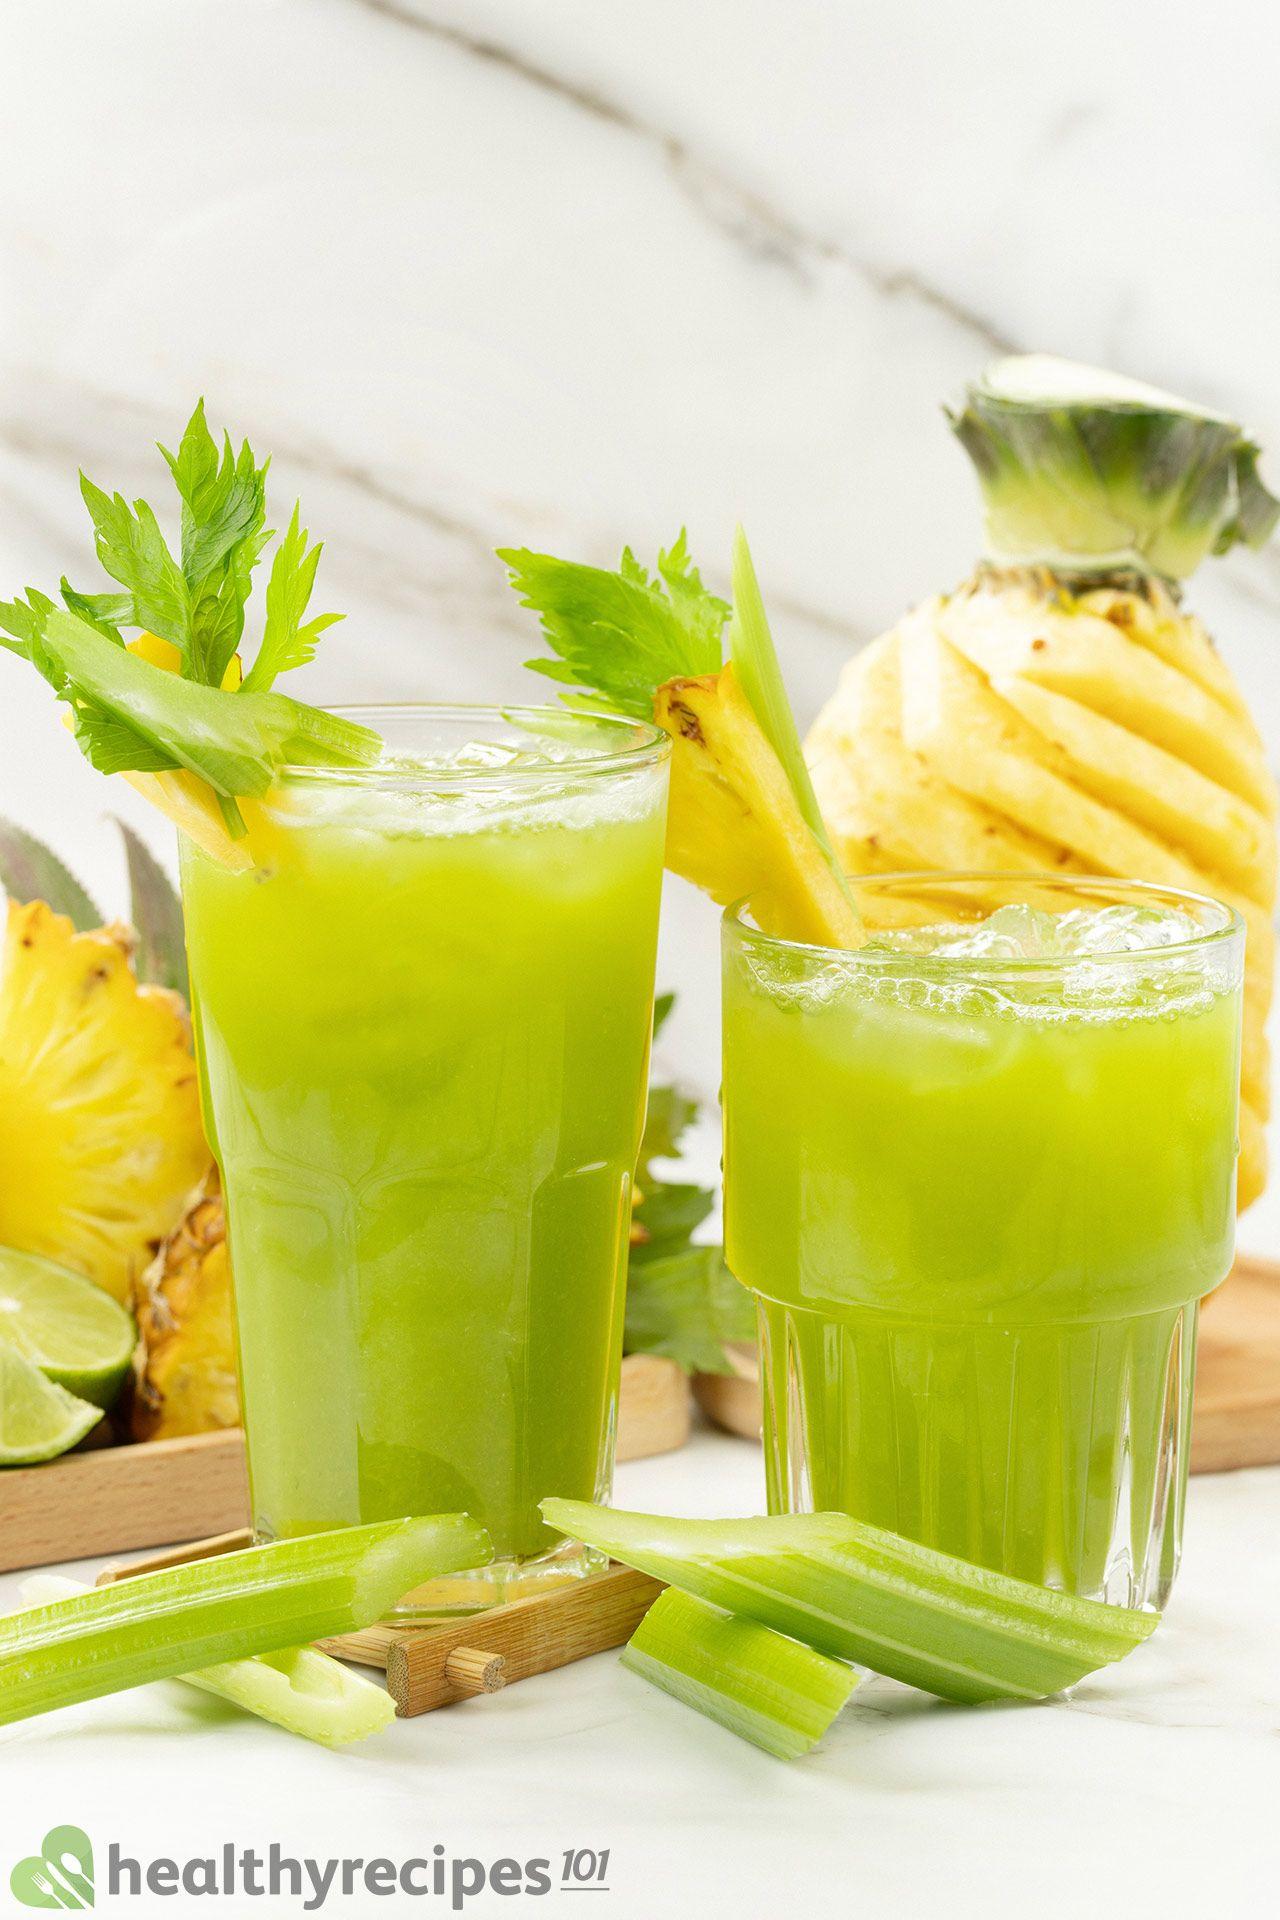 how long does pineapple celery juice last